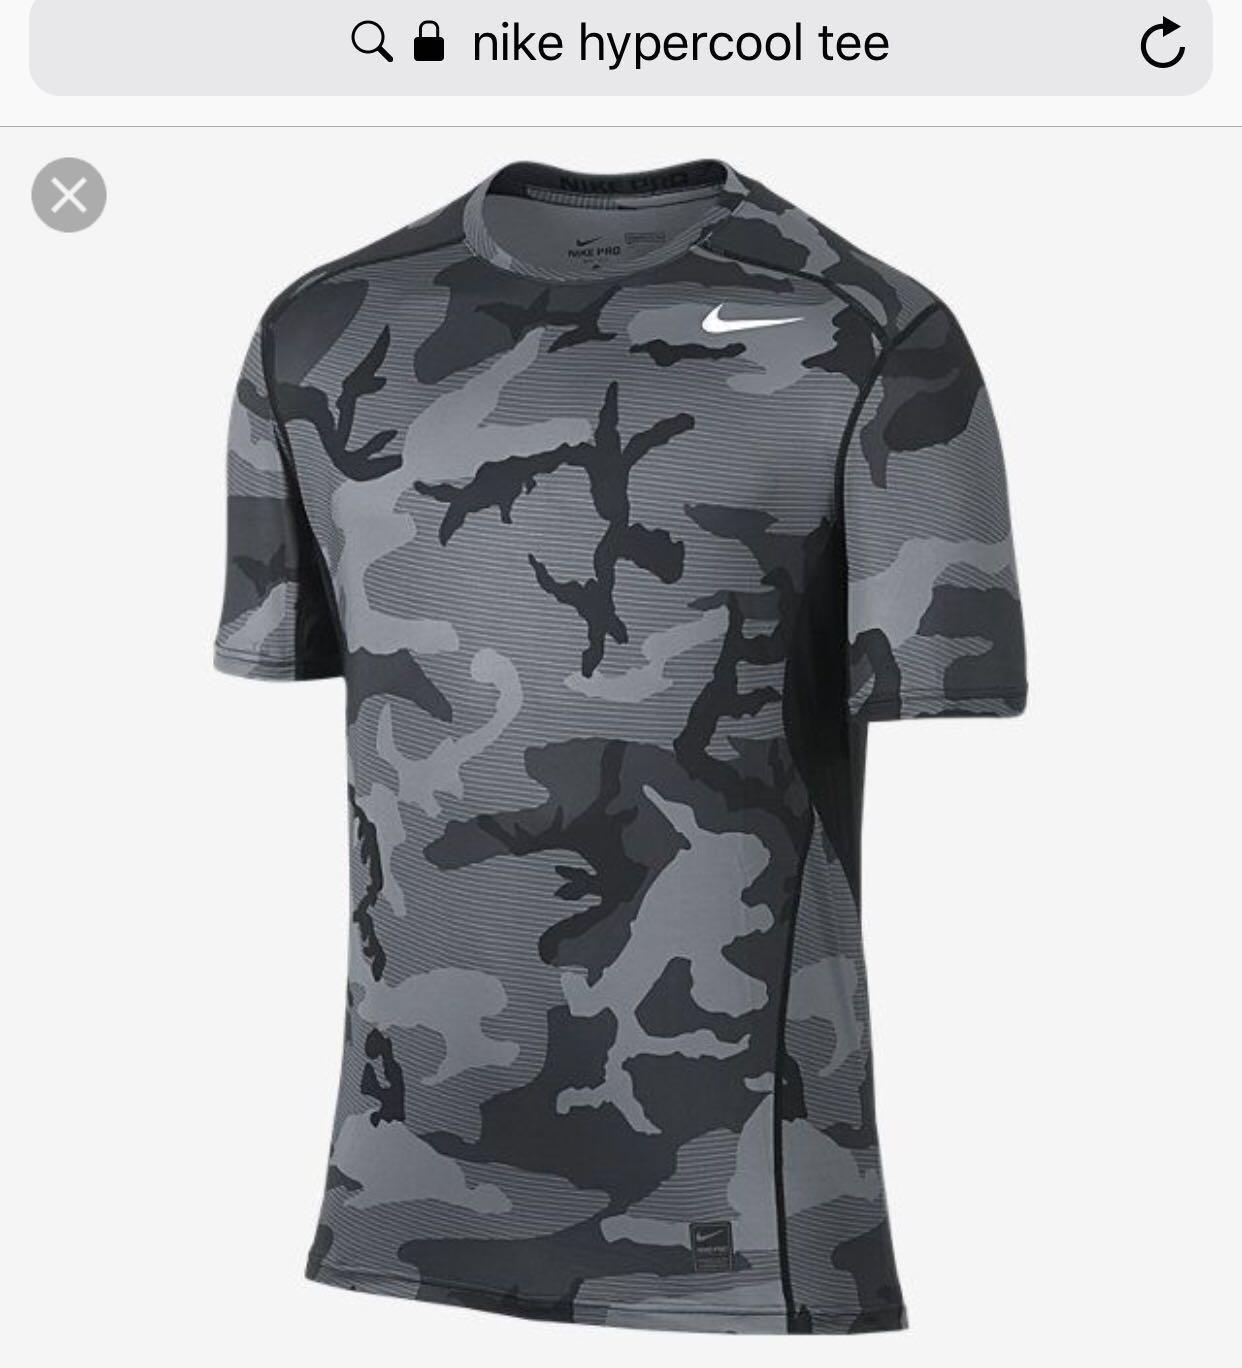 8bd10784 Nike Pro Combat Compression Tights Wear, Sports, Sports Apparel on ...